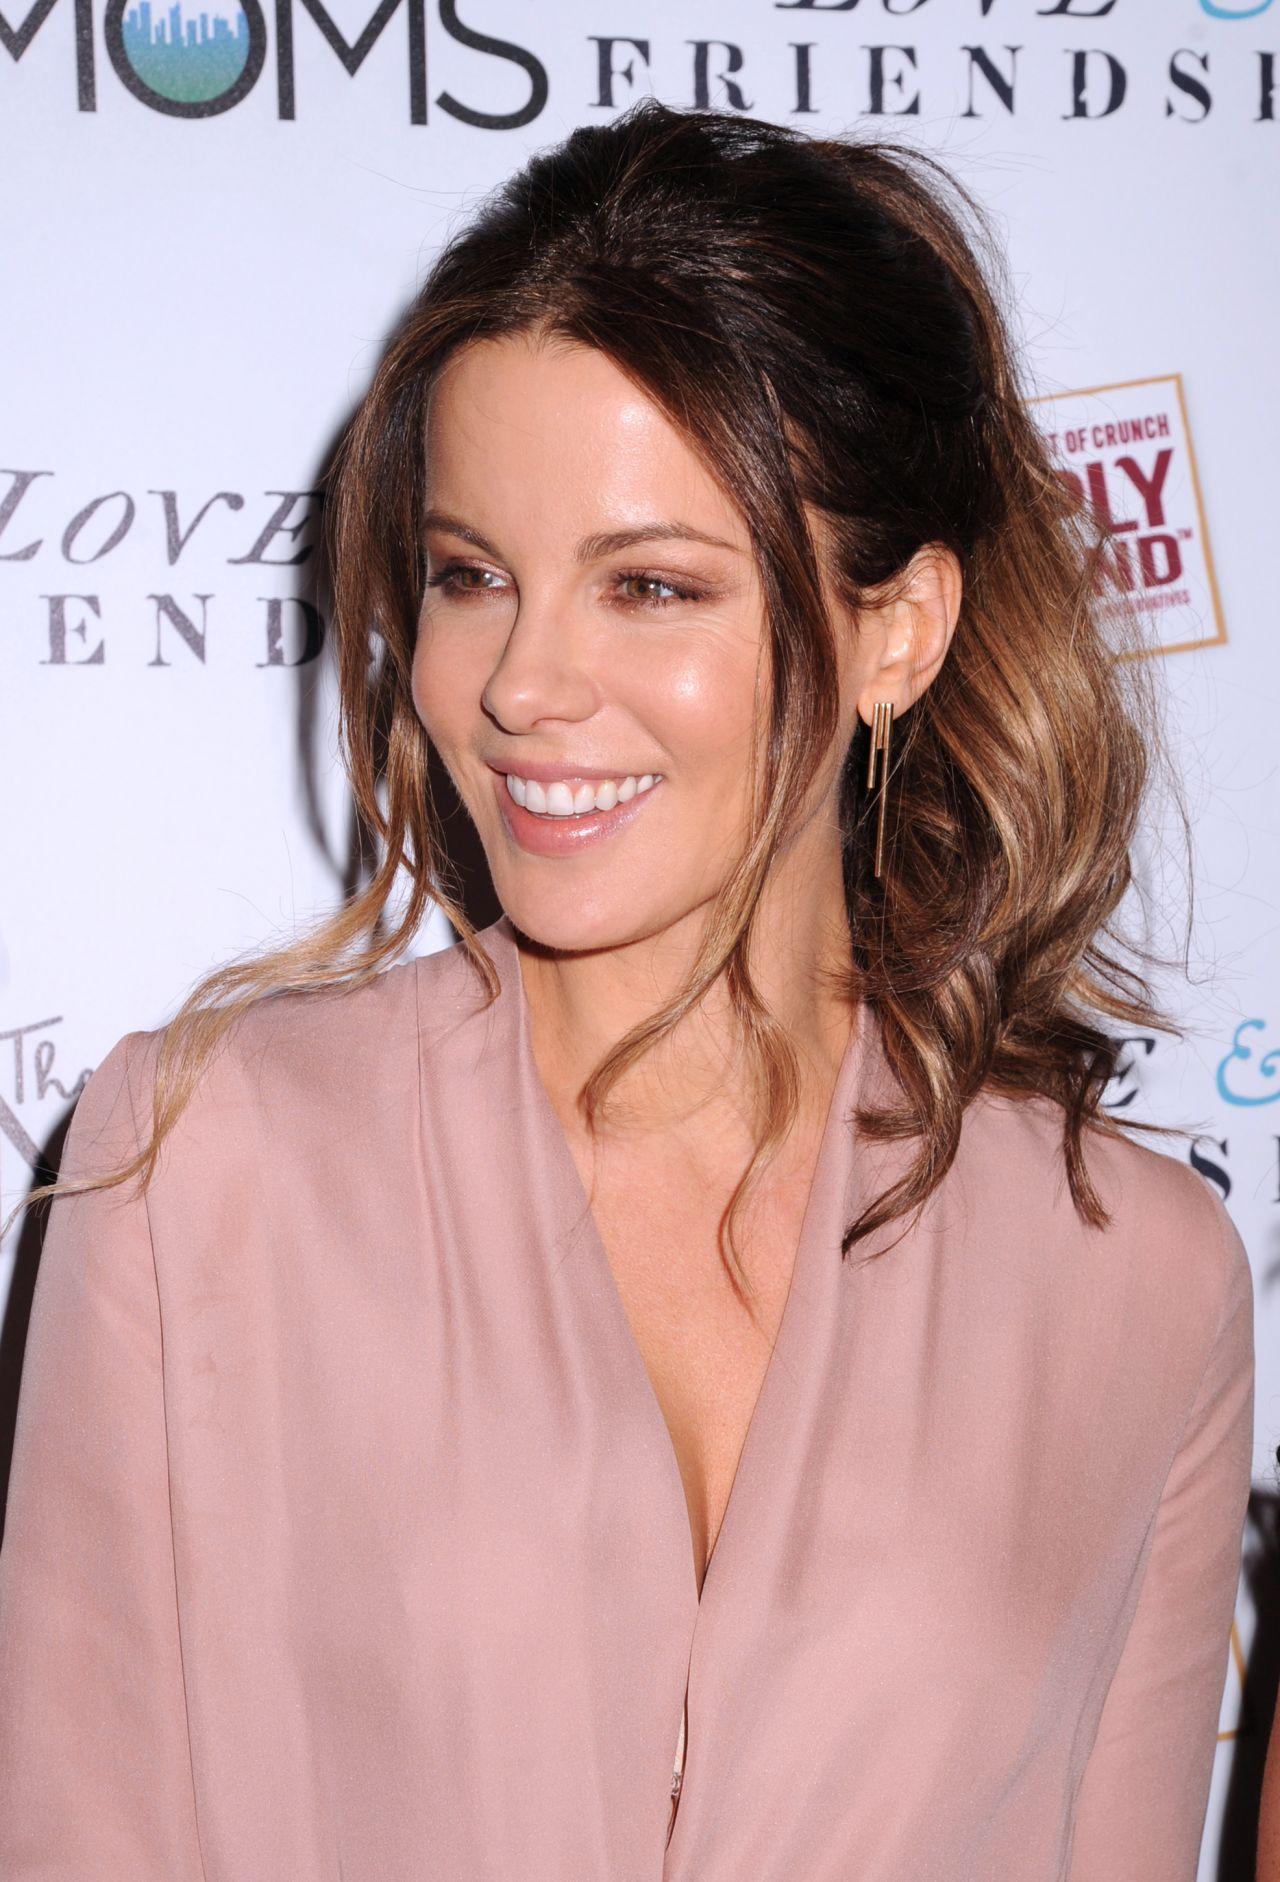 Kate Beckinsale - Screening of 'Love & Friendship' in New ... Kate Beckinsale